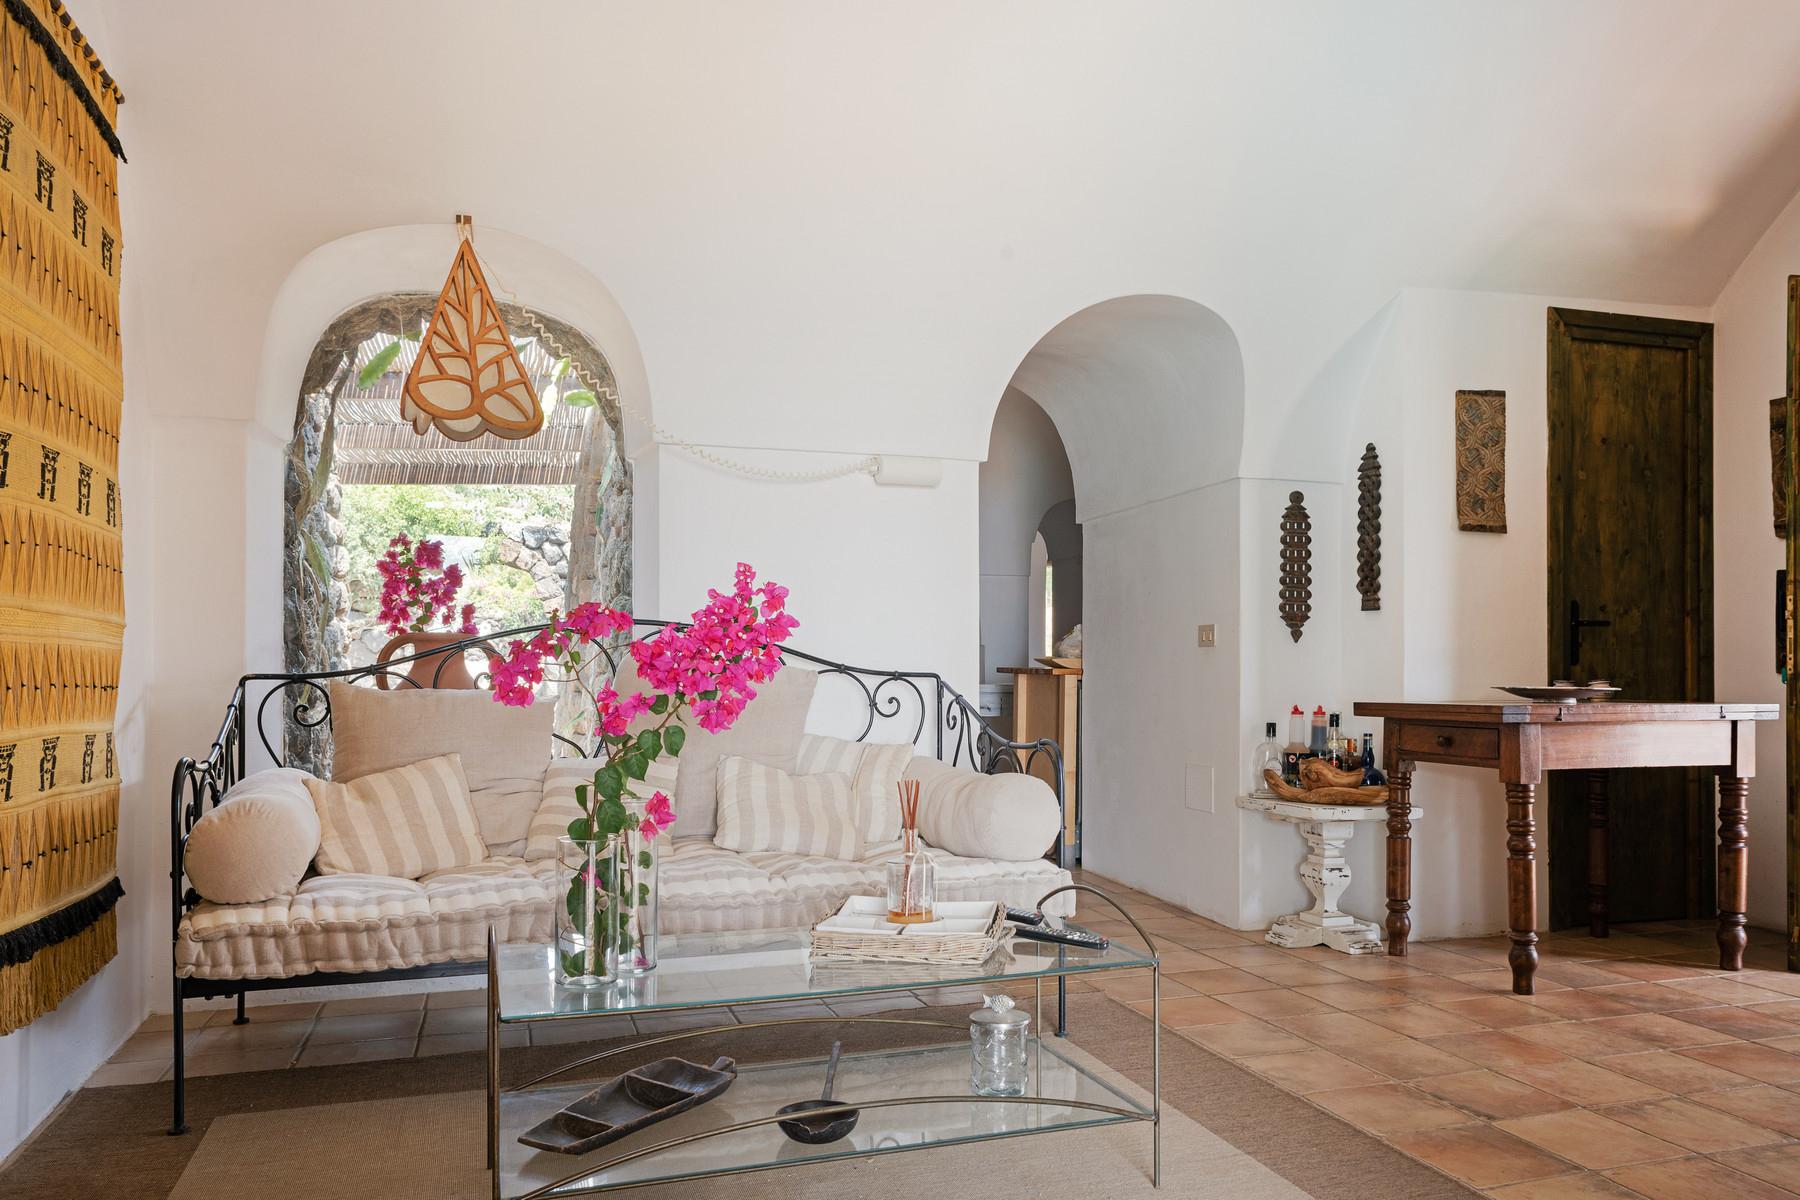 Villa in Vendita a Pantelleria: 5 locali, 82 mq - Foto 5